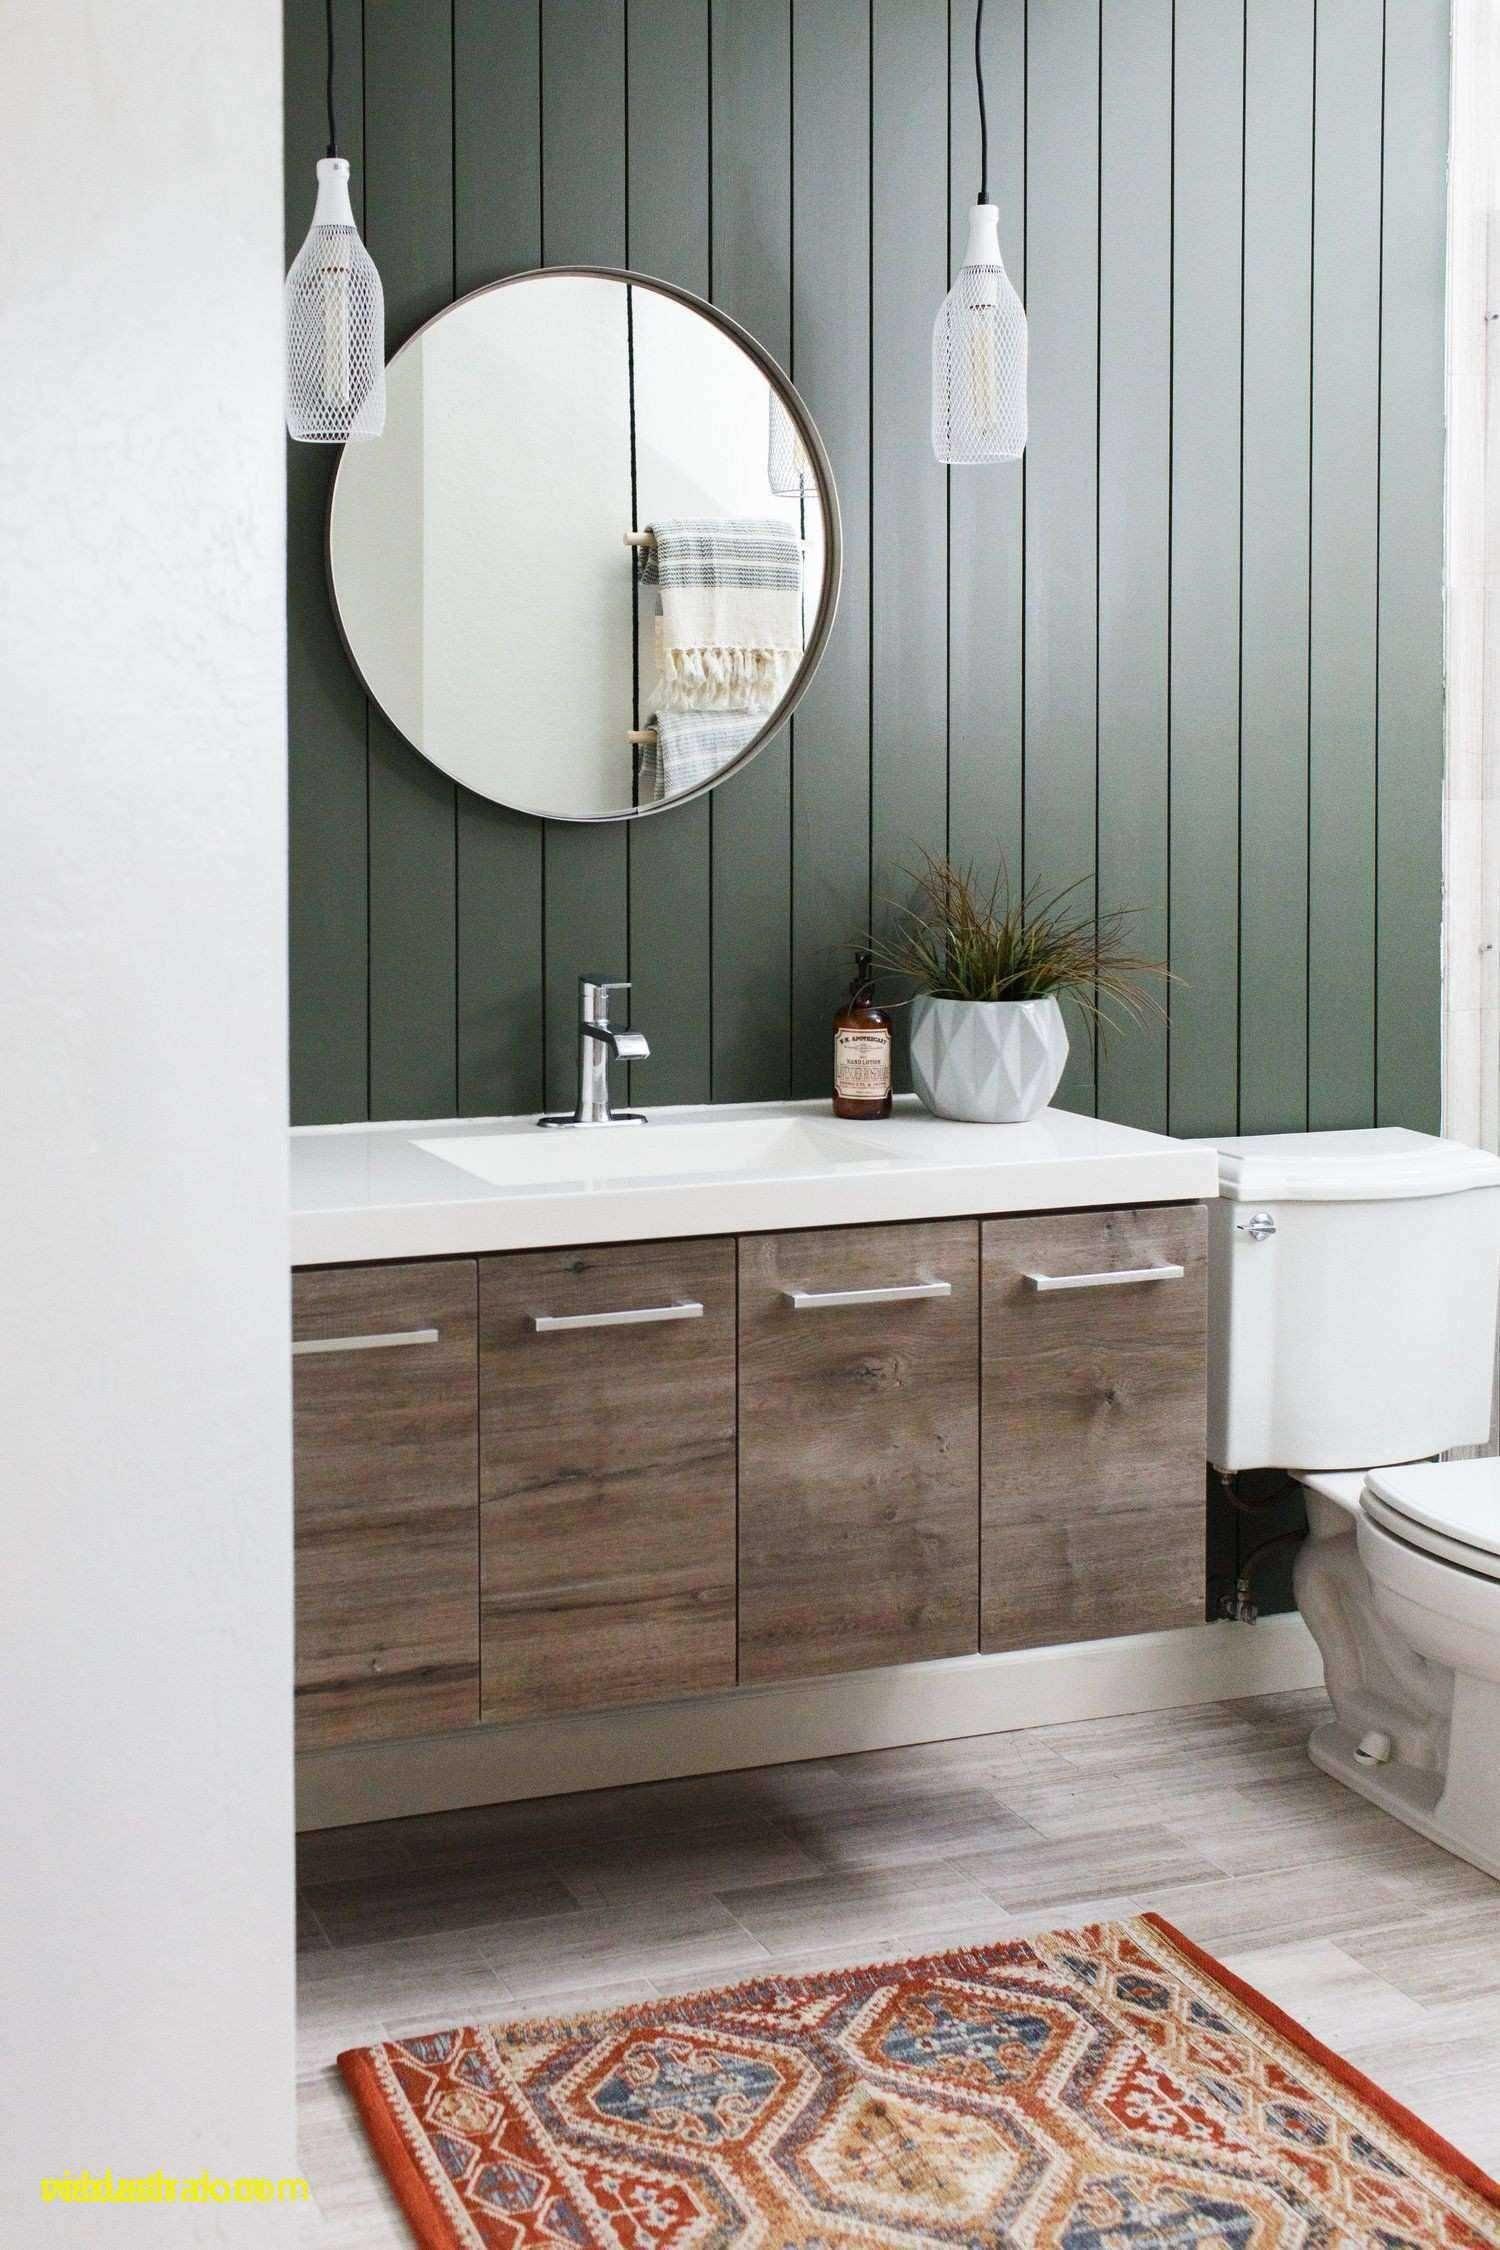 Luxury Bohemian Farmhouse Bathroom Rustic bathroom